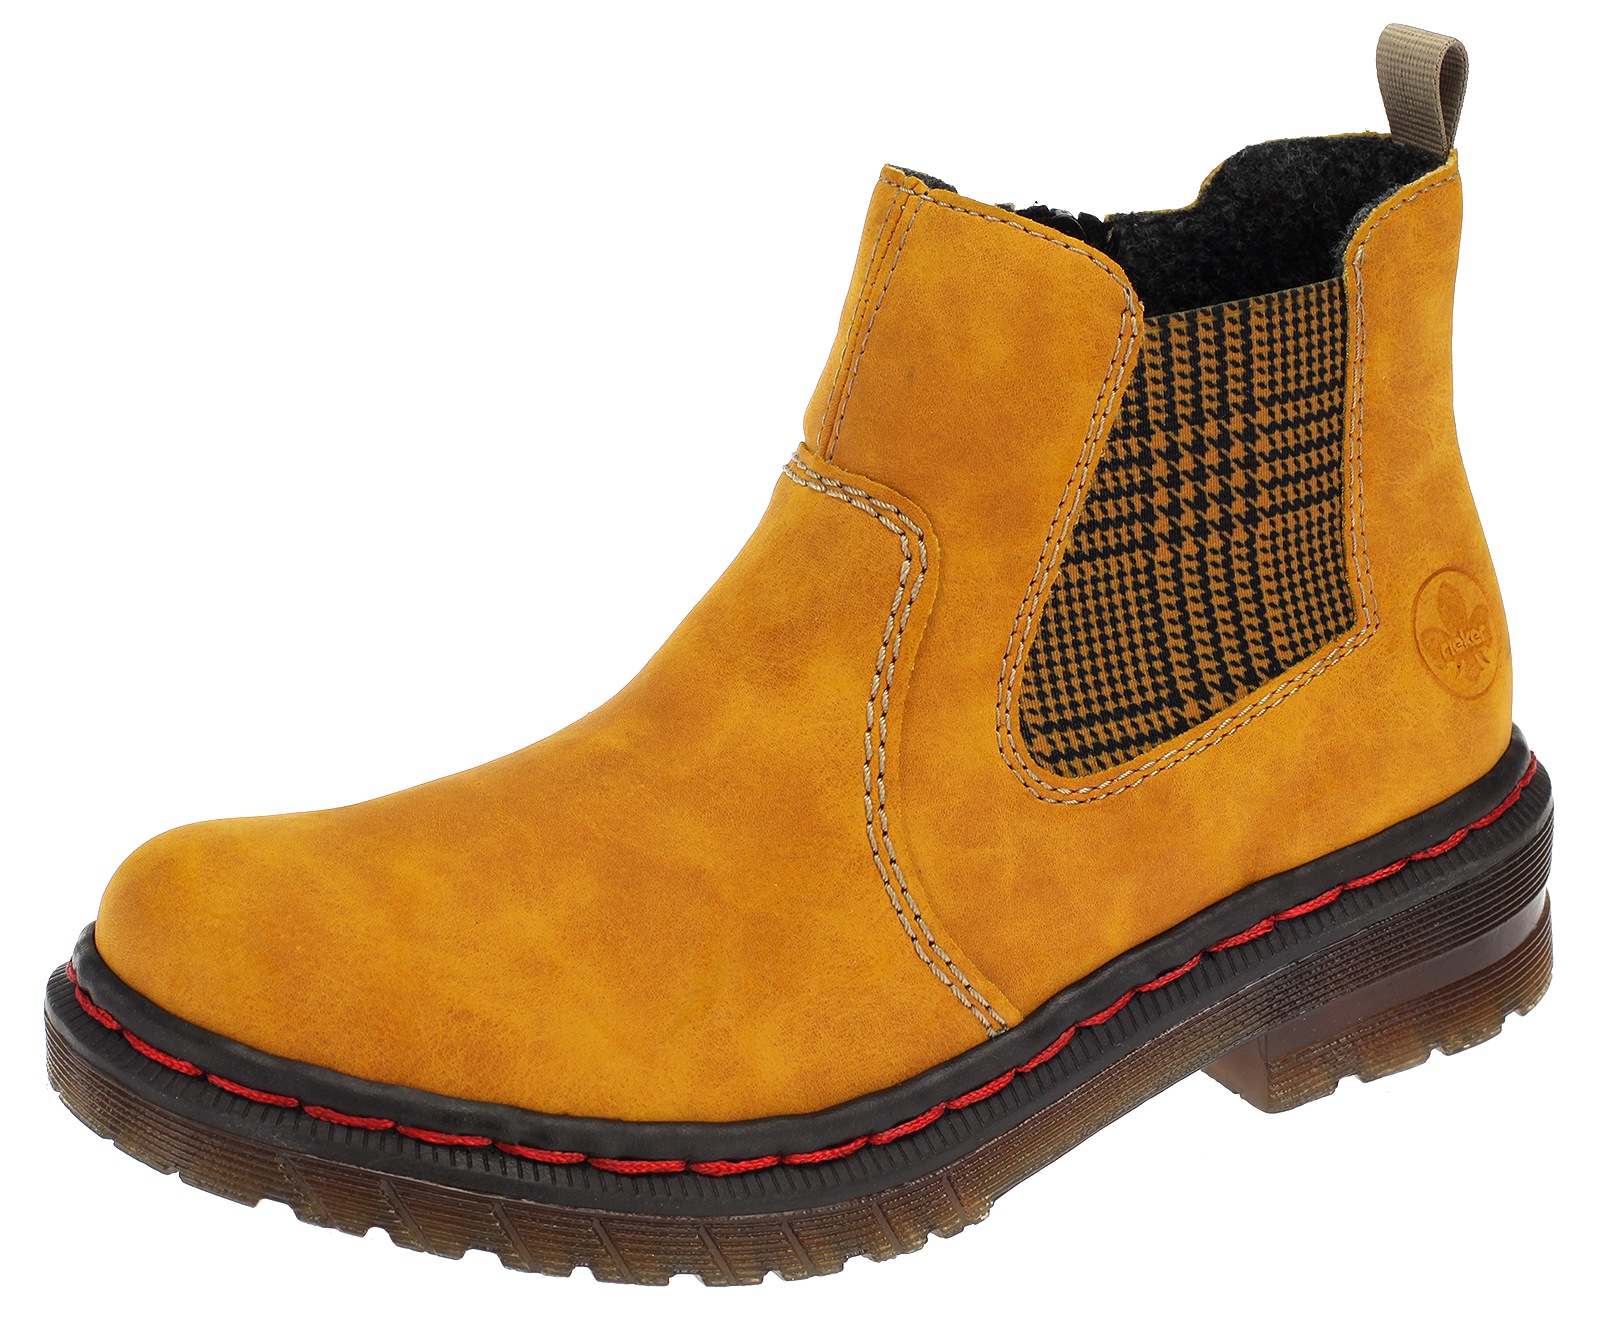 Damen Chelsea Boots Rieker Stiefeletten Winterboots Stiefel Gefüttert Gelb 76264-68